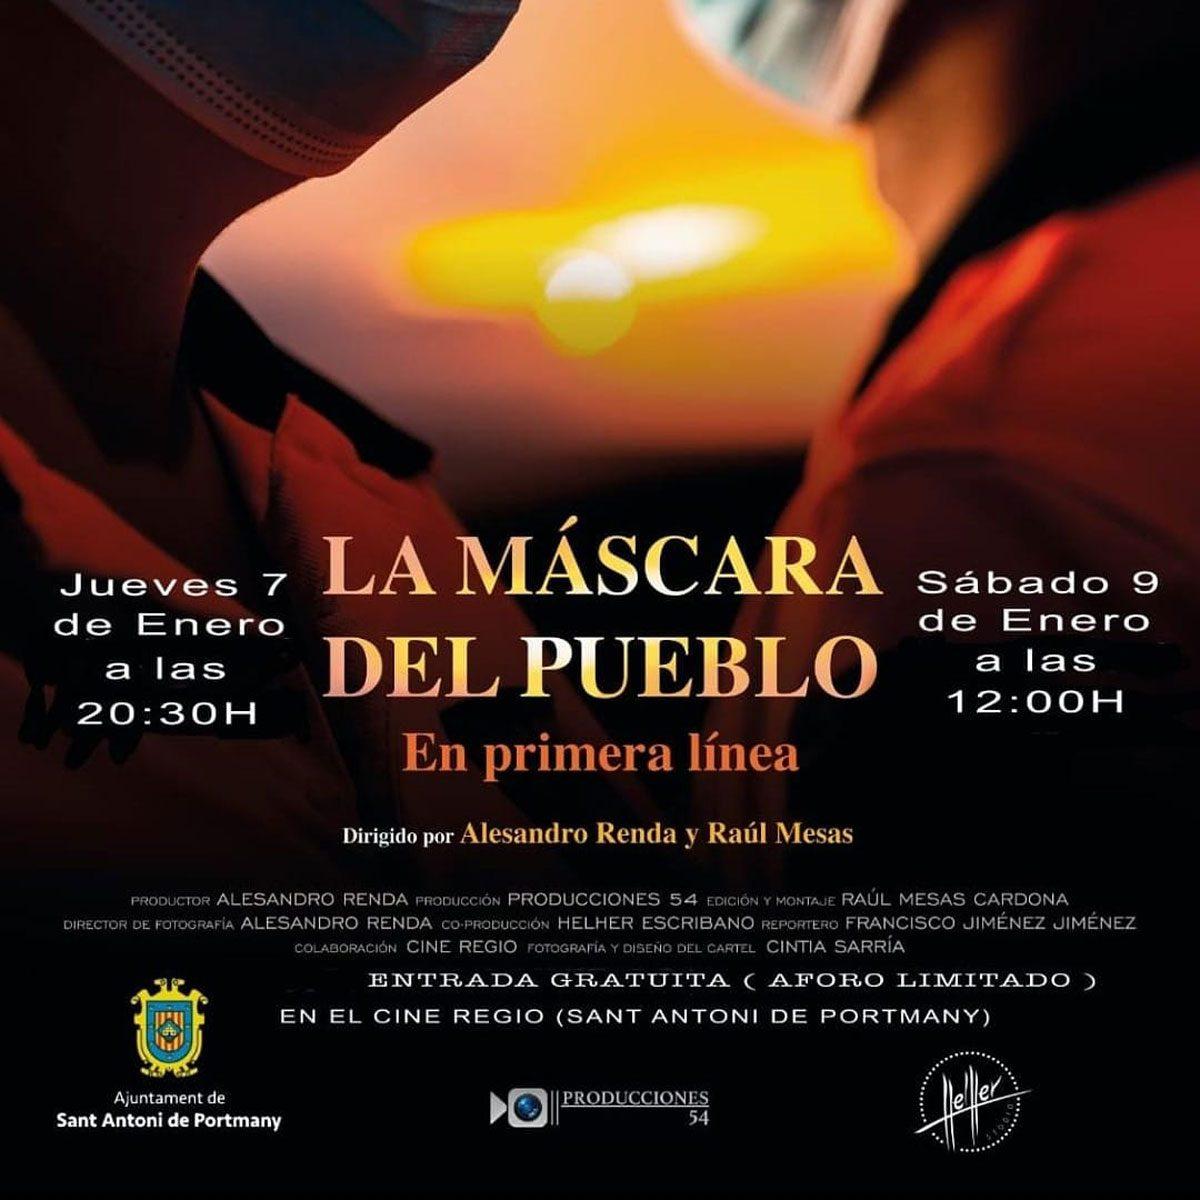 le-masque-du-peuple-ibiza-cine-regio-2021-welcometoibiza